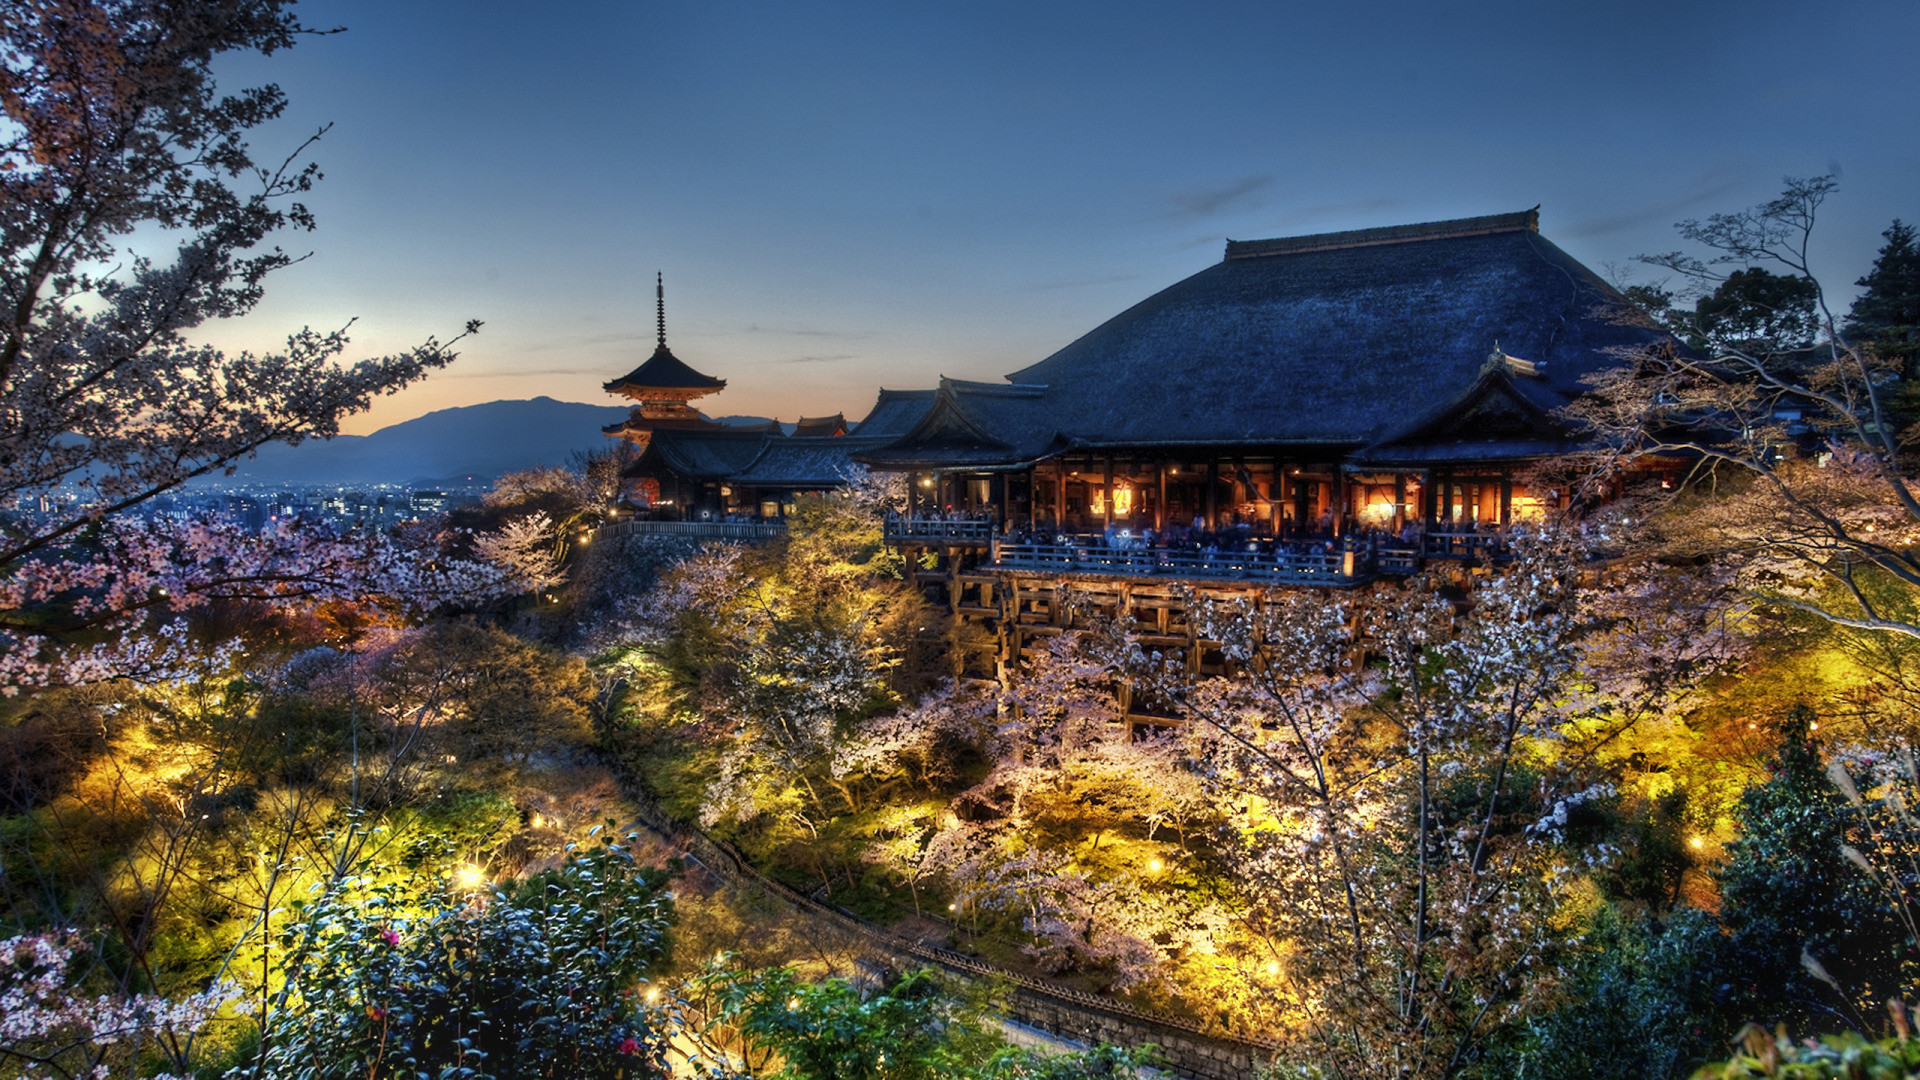 Home of the Tree Samurai, Japan widescreen wallpaper